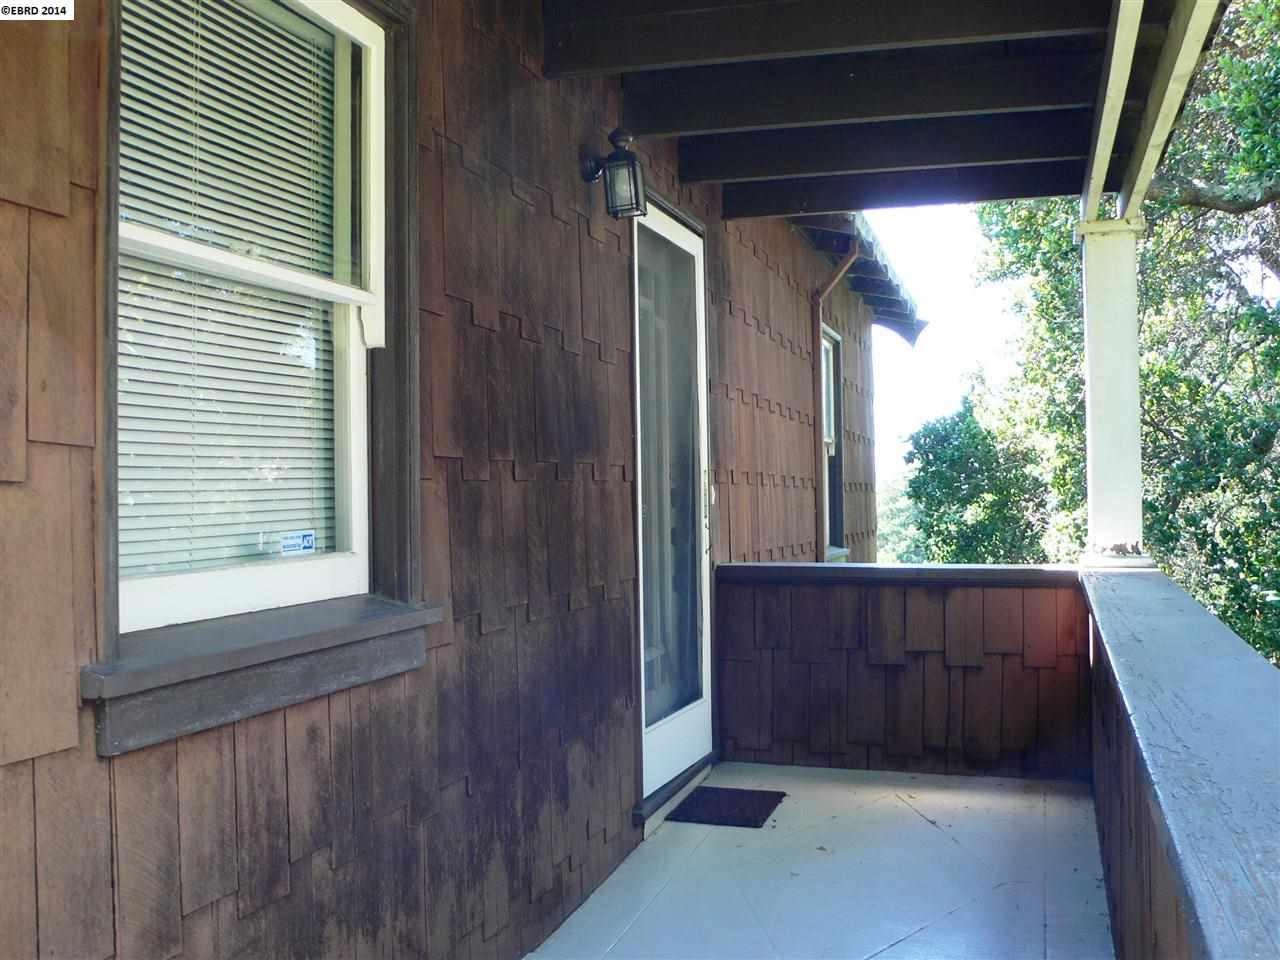 Additional photo for property listing at 548 VINCENTE Avenue  Berkeley, Californie 94707 États-Unis